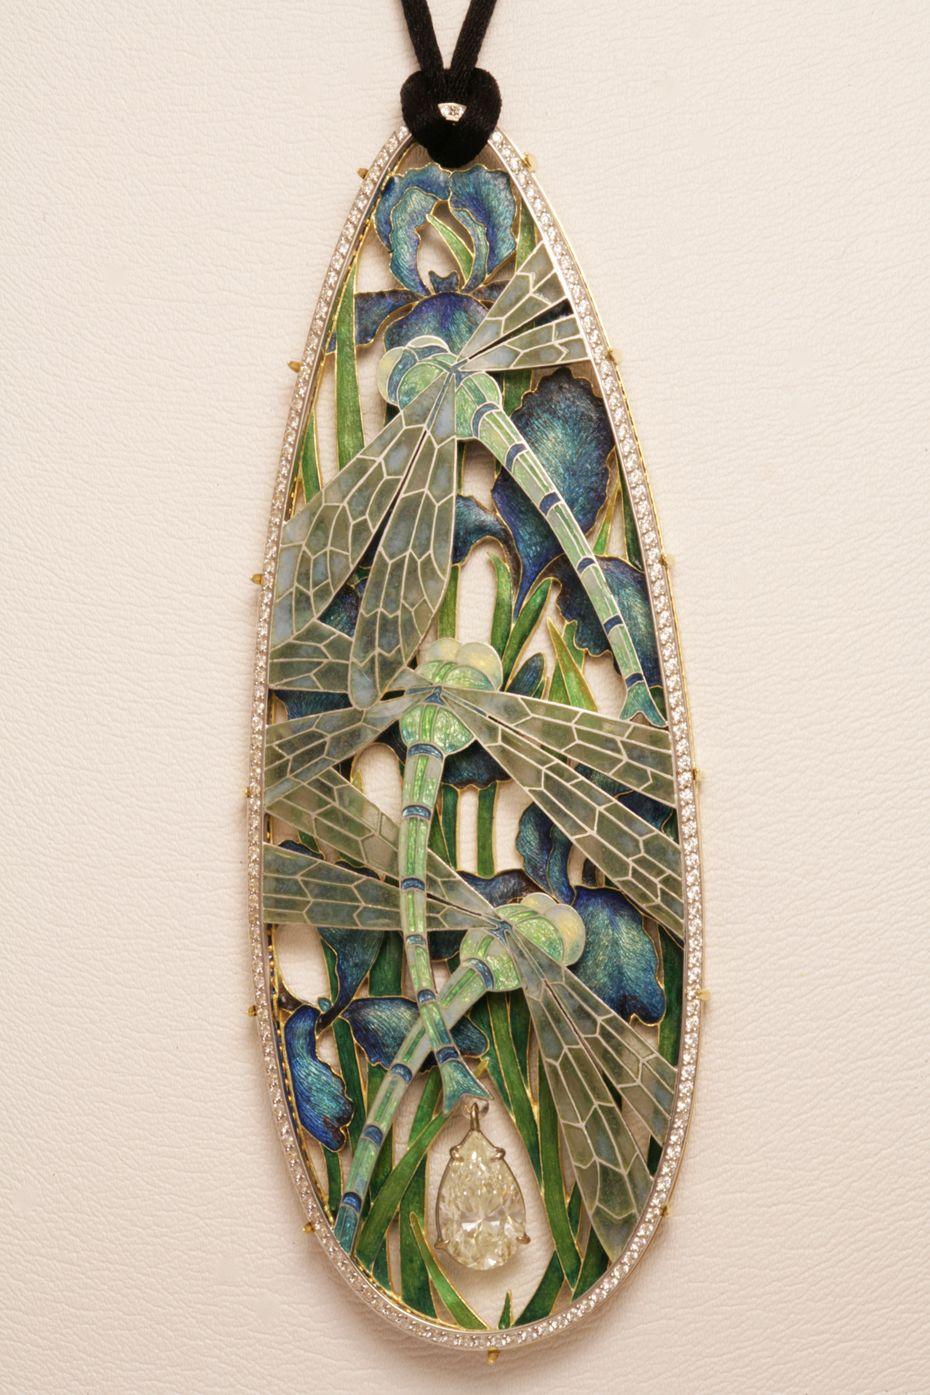 Russian jeweller Ilgiz F has earned international acclaim for his intricate enamel work | The Jewellery Editor